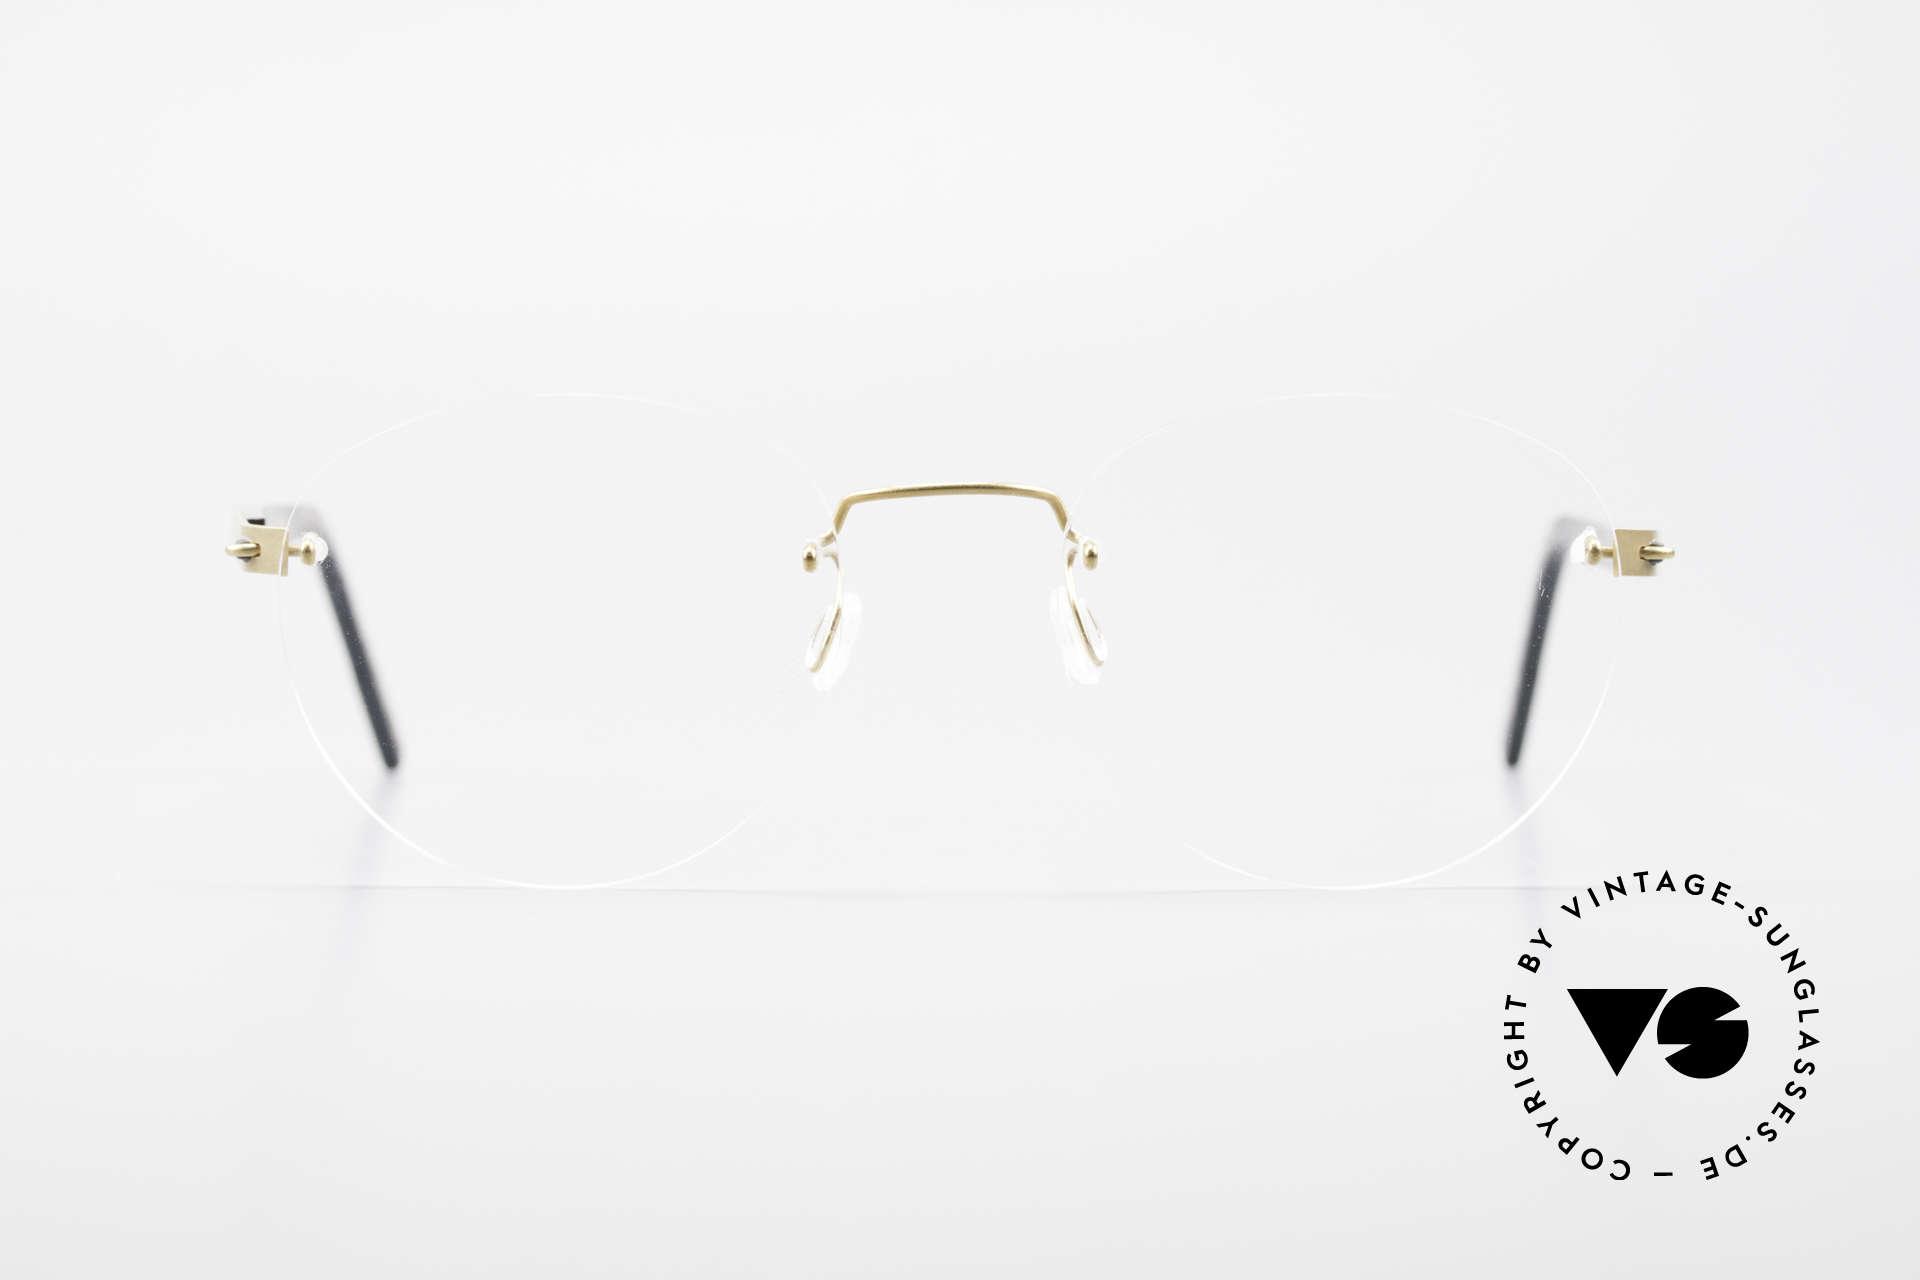 Lindberg 2110 Spirit Titan Round Rimless Titanium Frame, distinctive quality and design (award-winning frame), Made for Men and Women